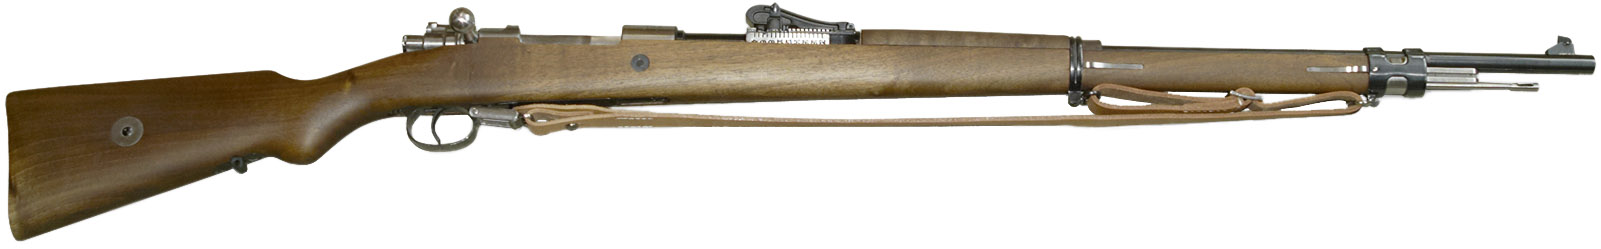 Винтовка Mauser Gewehr 98, вид справа